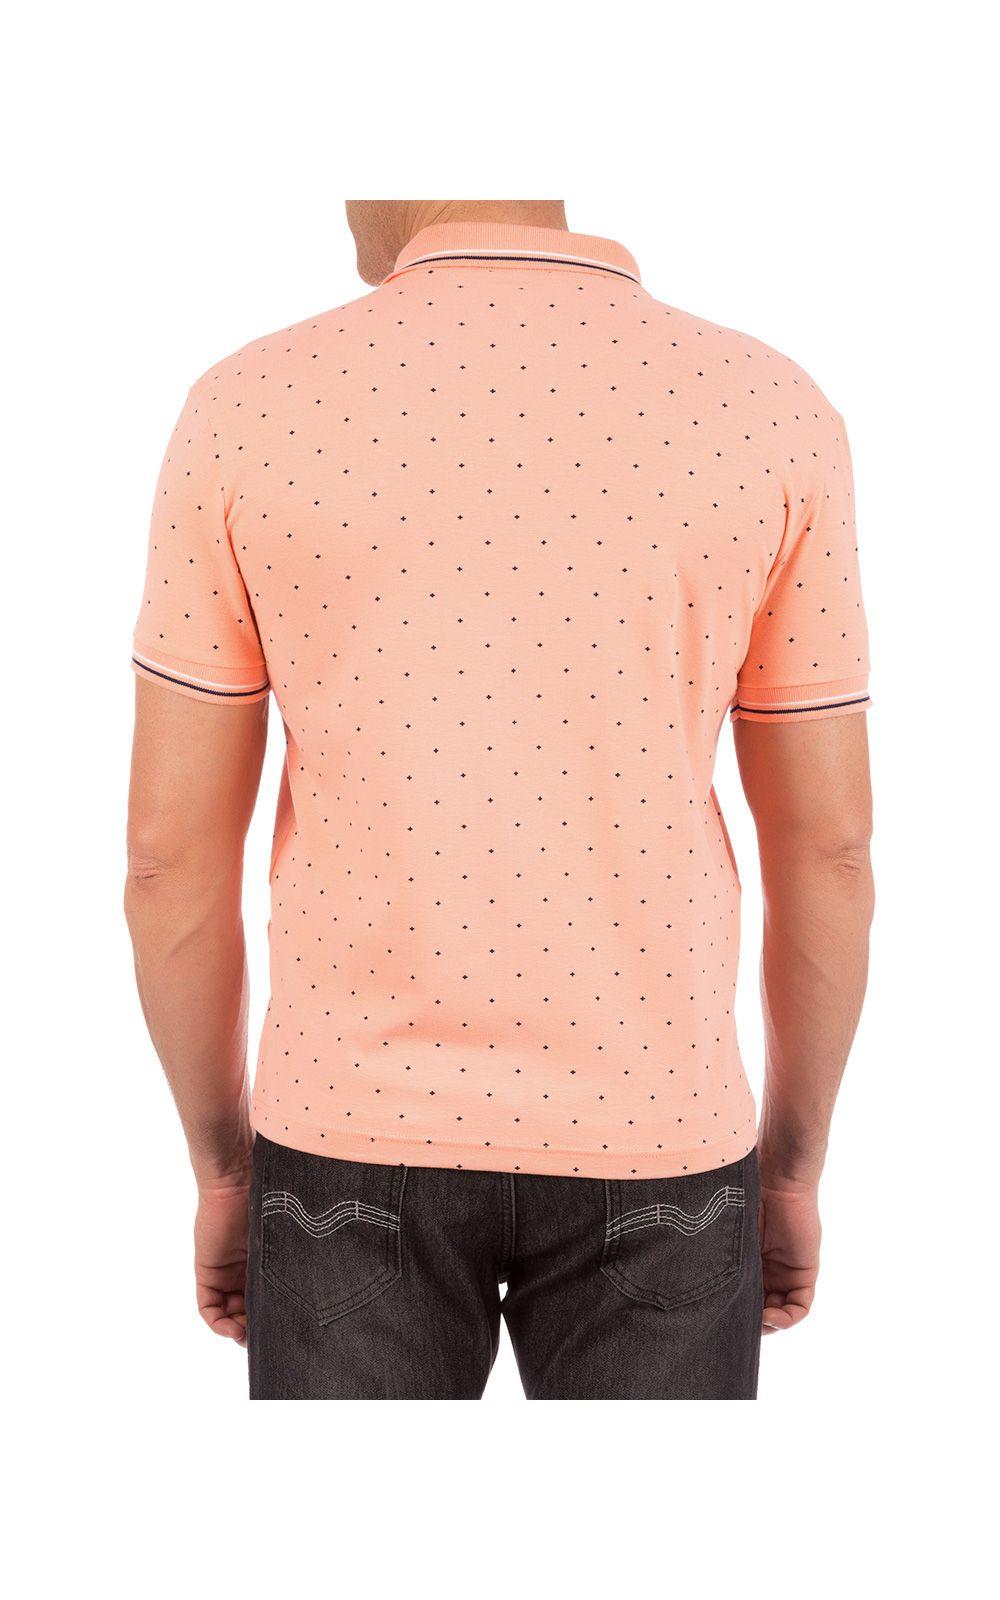 Foto 2 - Camisa Polo Masculina Laranja Estampada